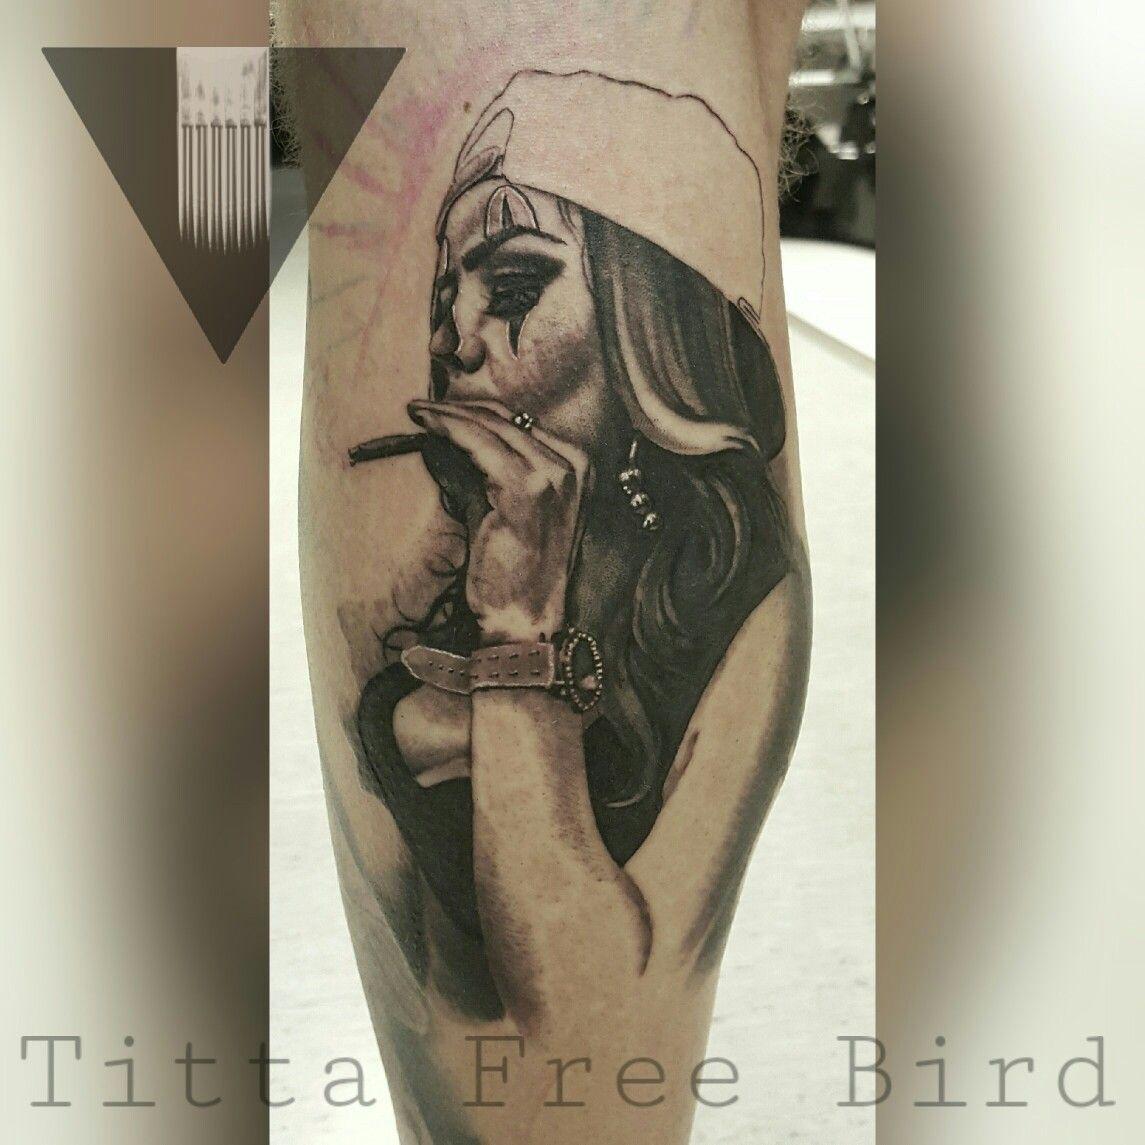 Badass girl tattoo in progress titta free bird bz tattoo for Girls with badass tattoos